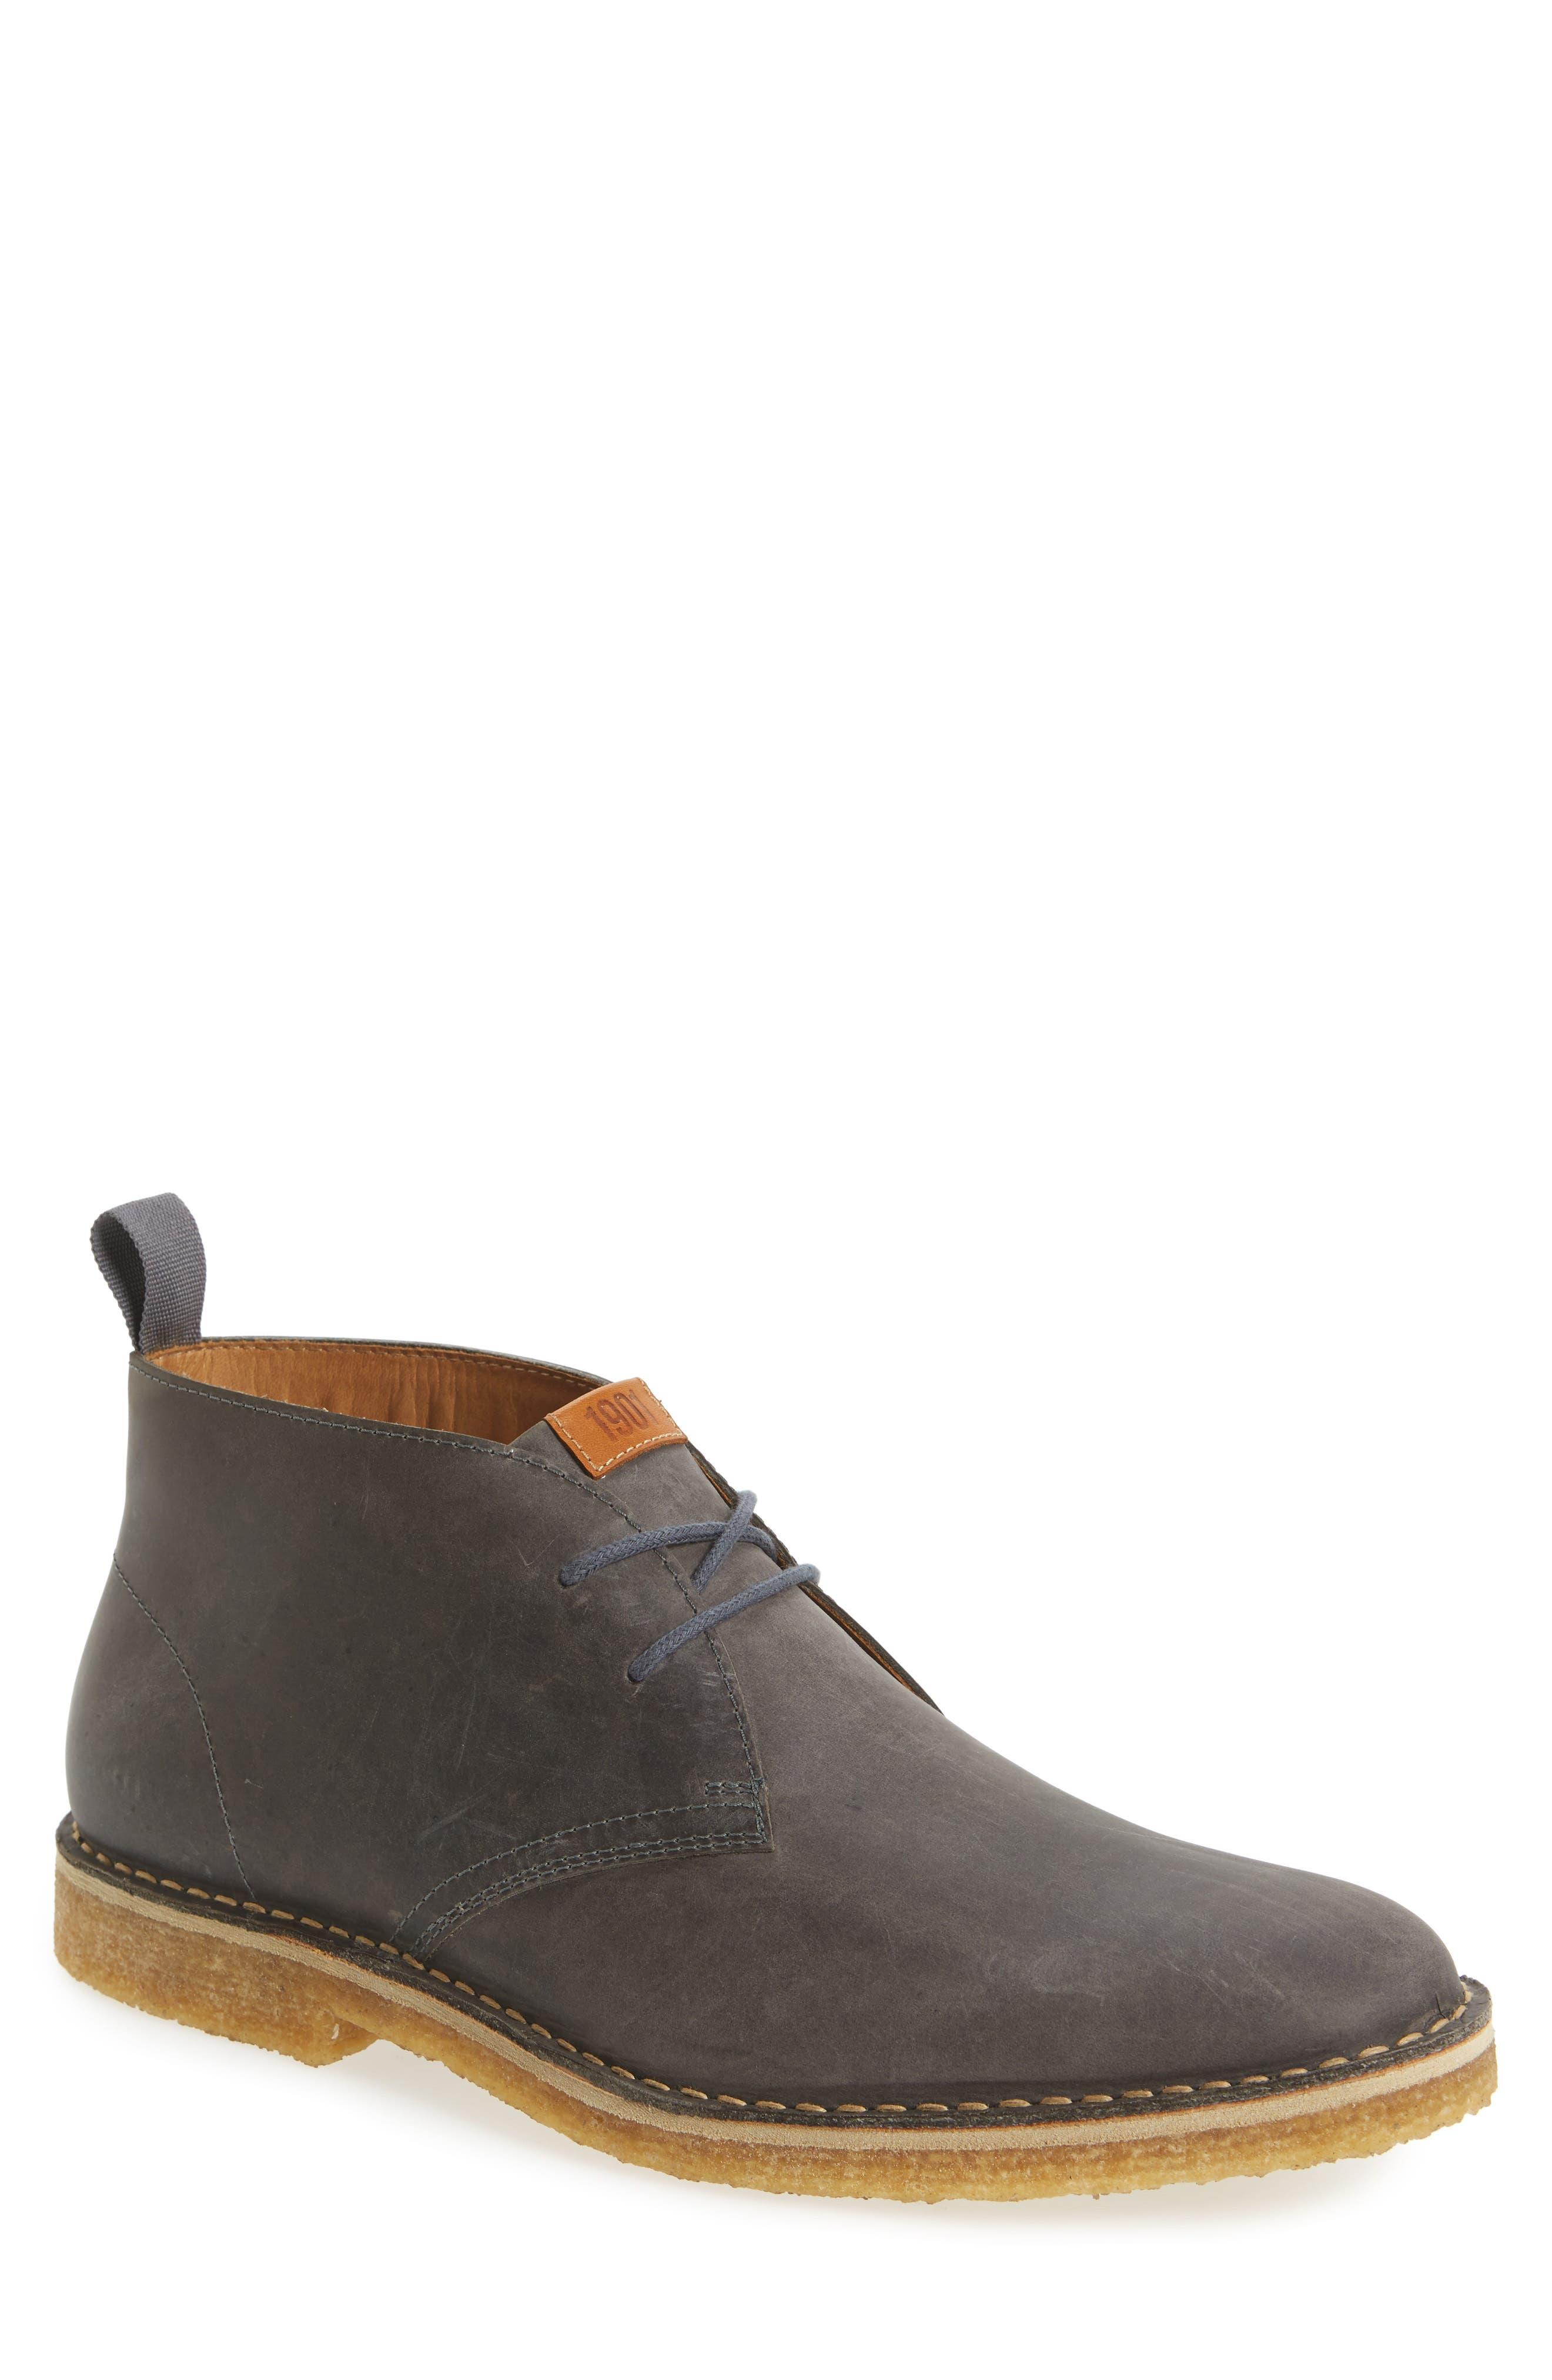 Alternate Image 1 Selected - 1901 Westport Chukka Boot (Men)